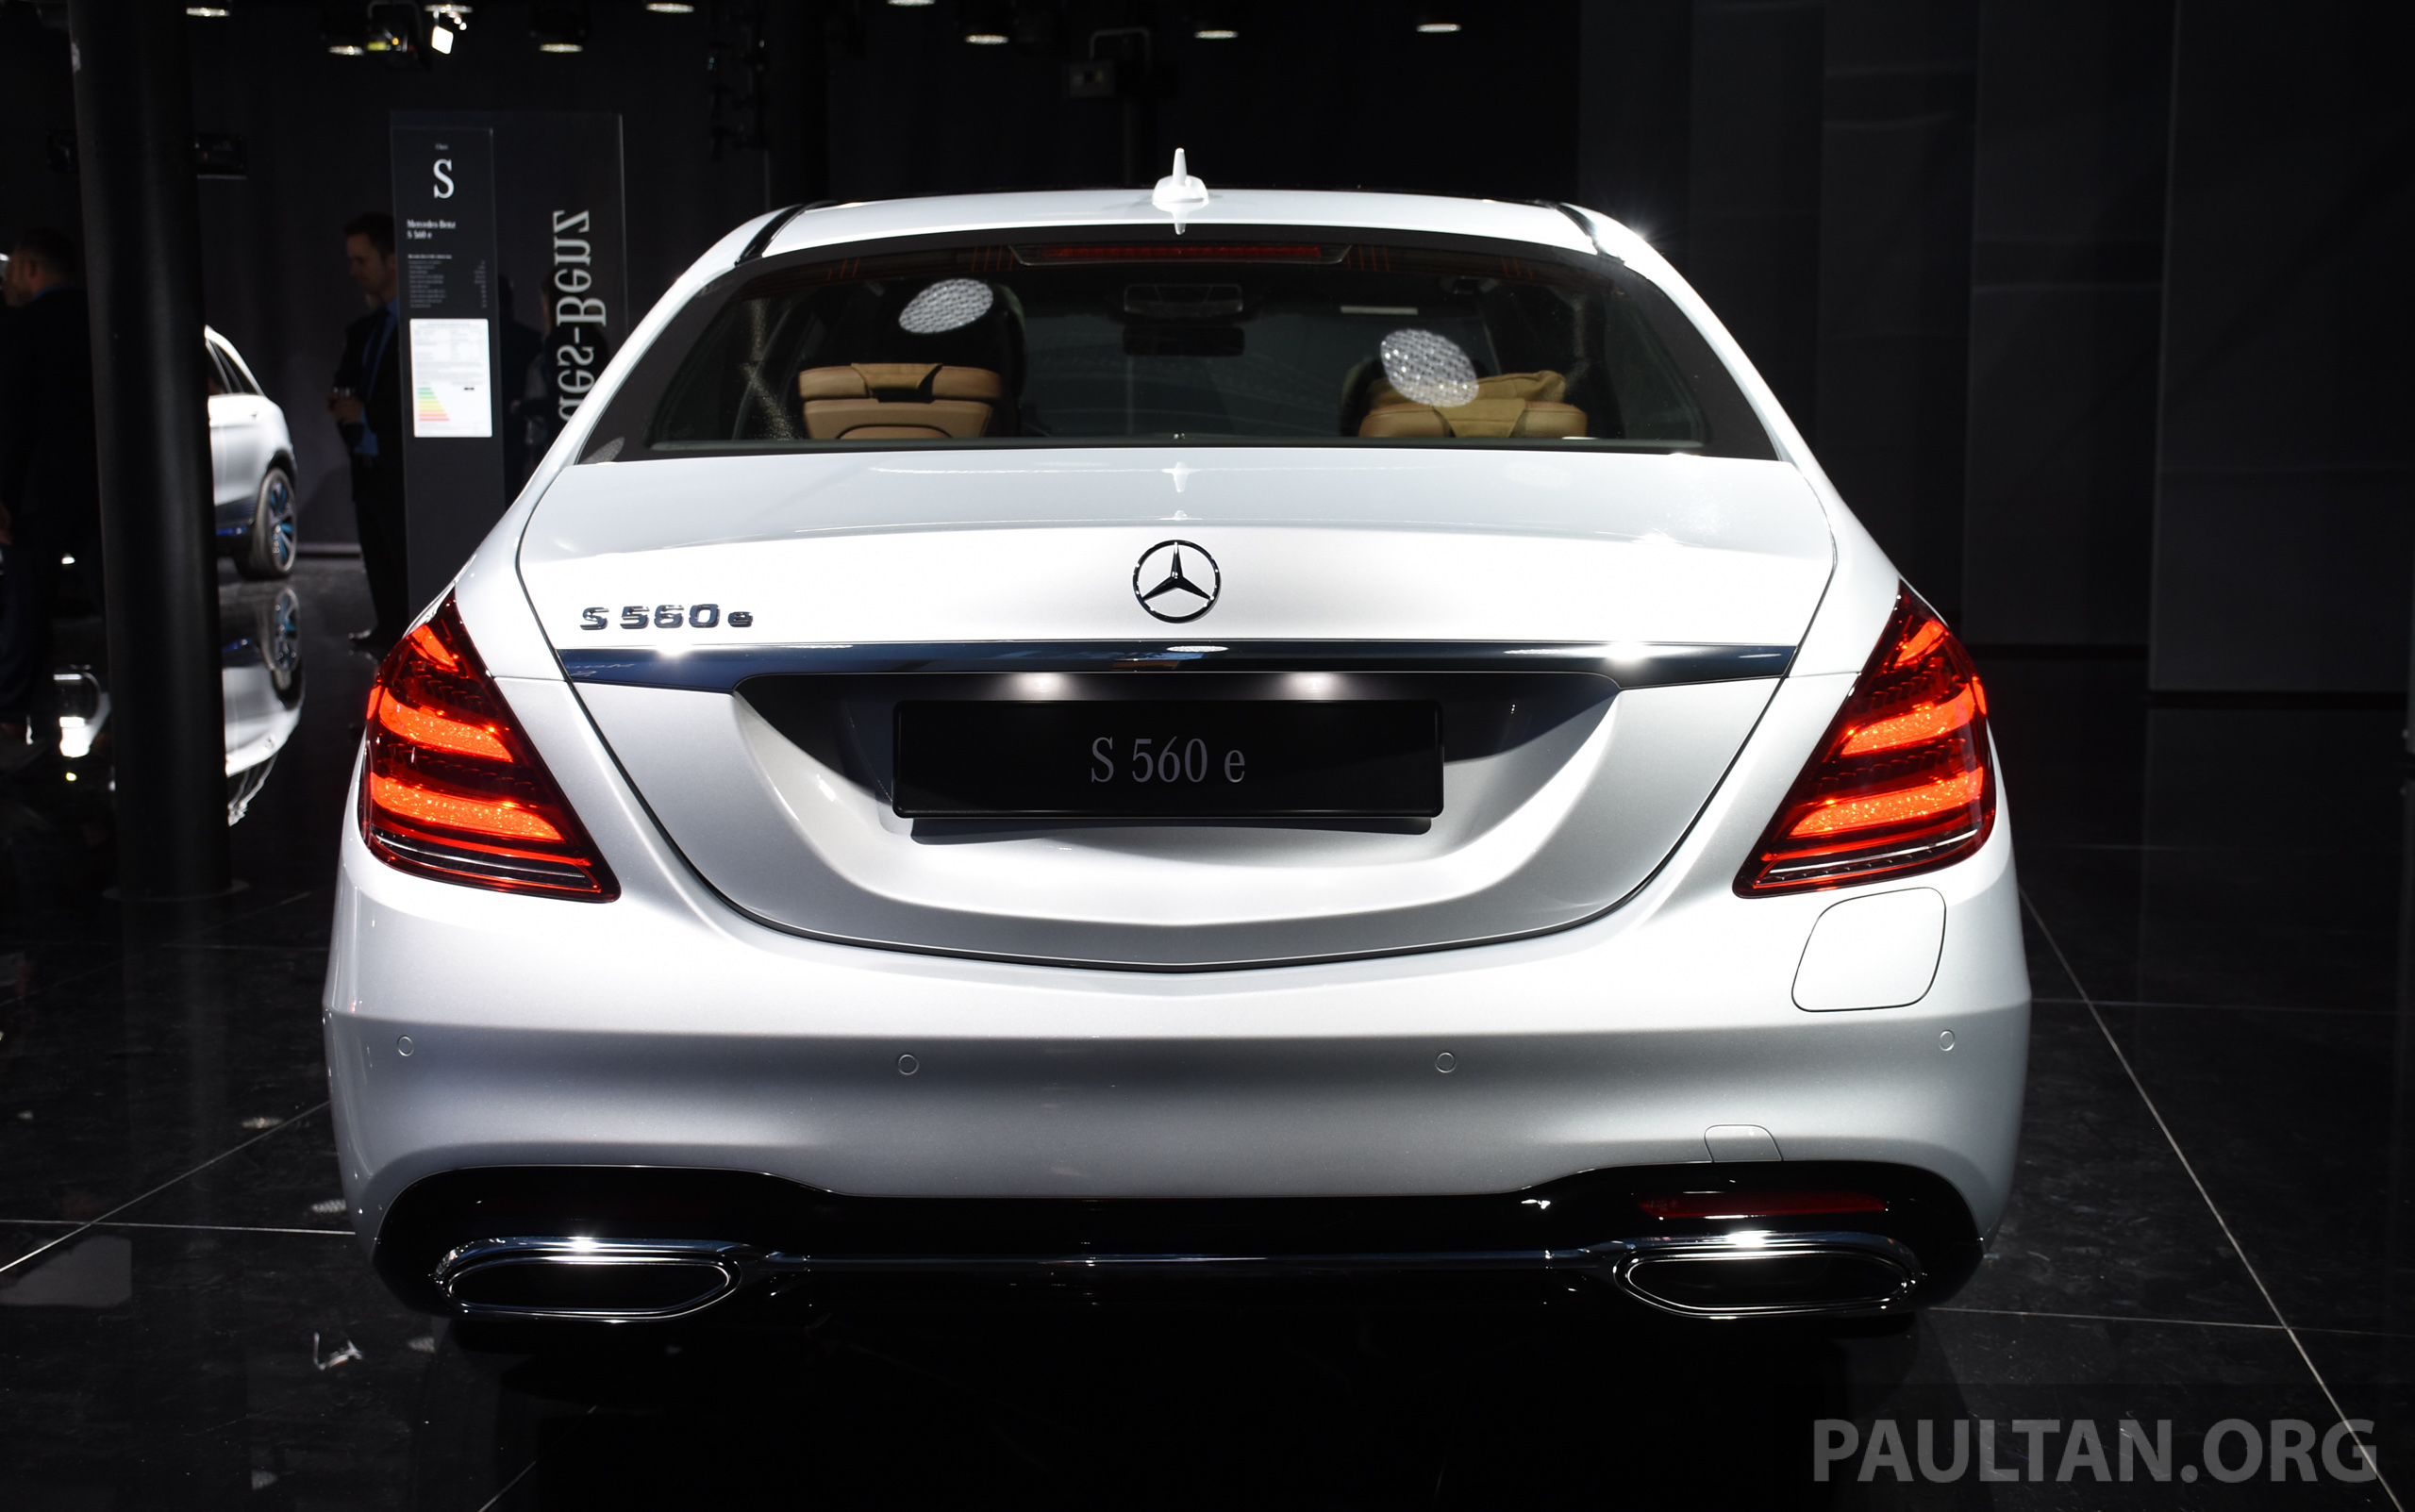 https://s2.paultan.org/image/2017/09/Mercedes-Benz-S560E-Frankfurt-4.jpg